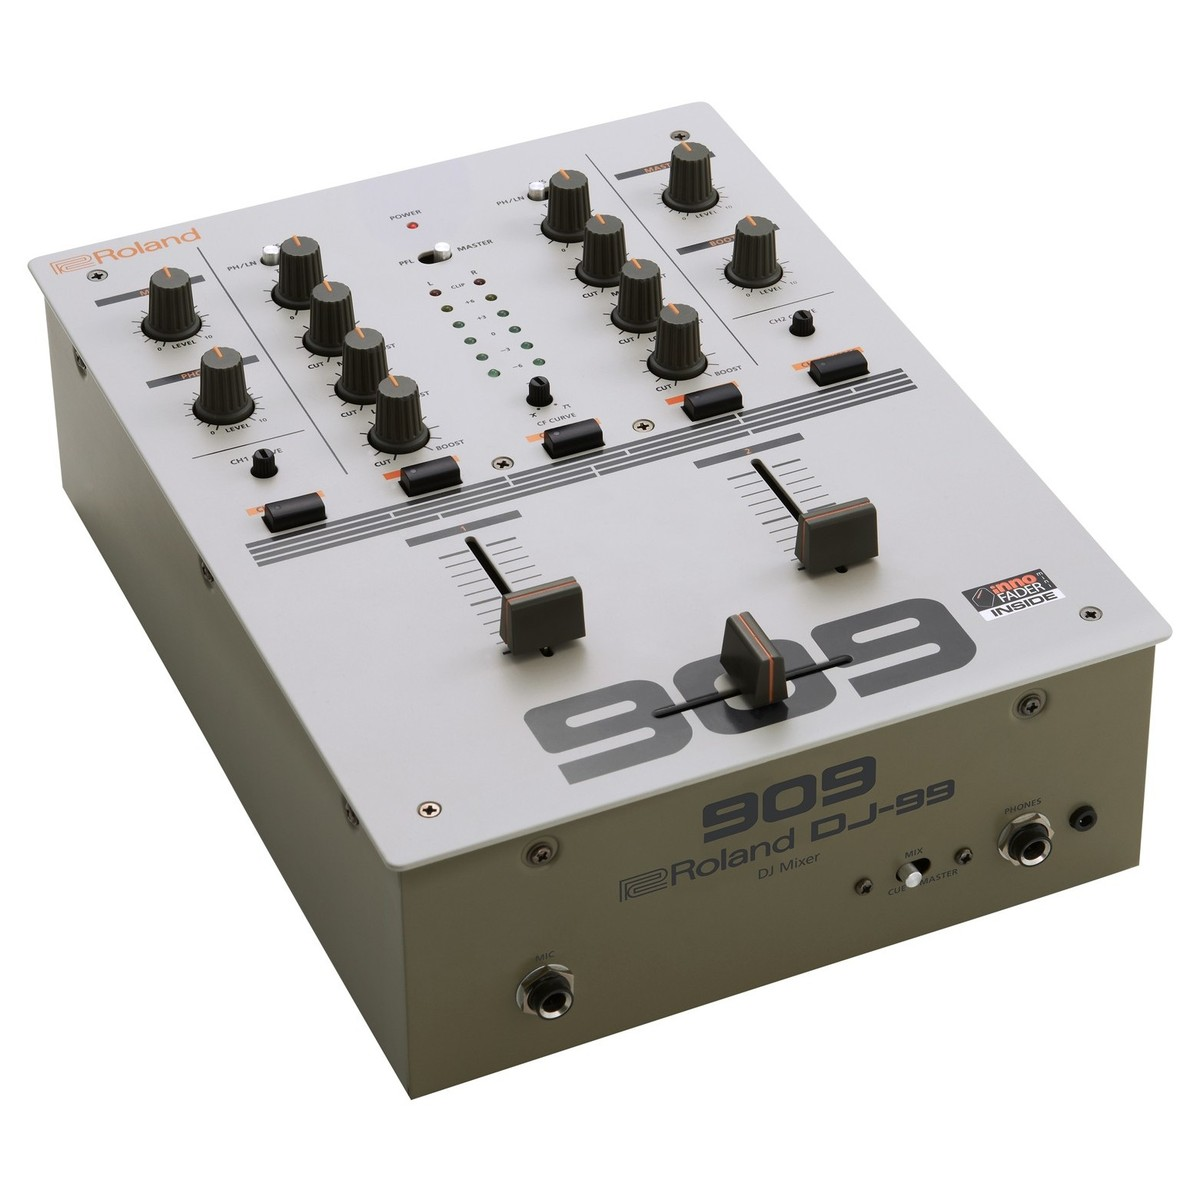 DJ Roland DJ-99